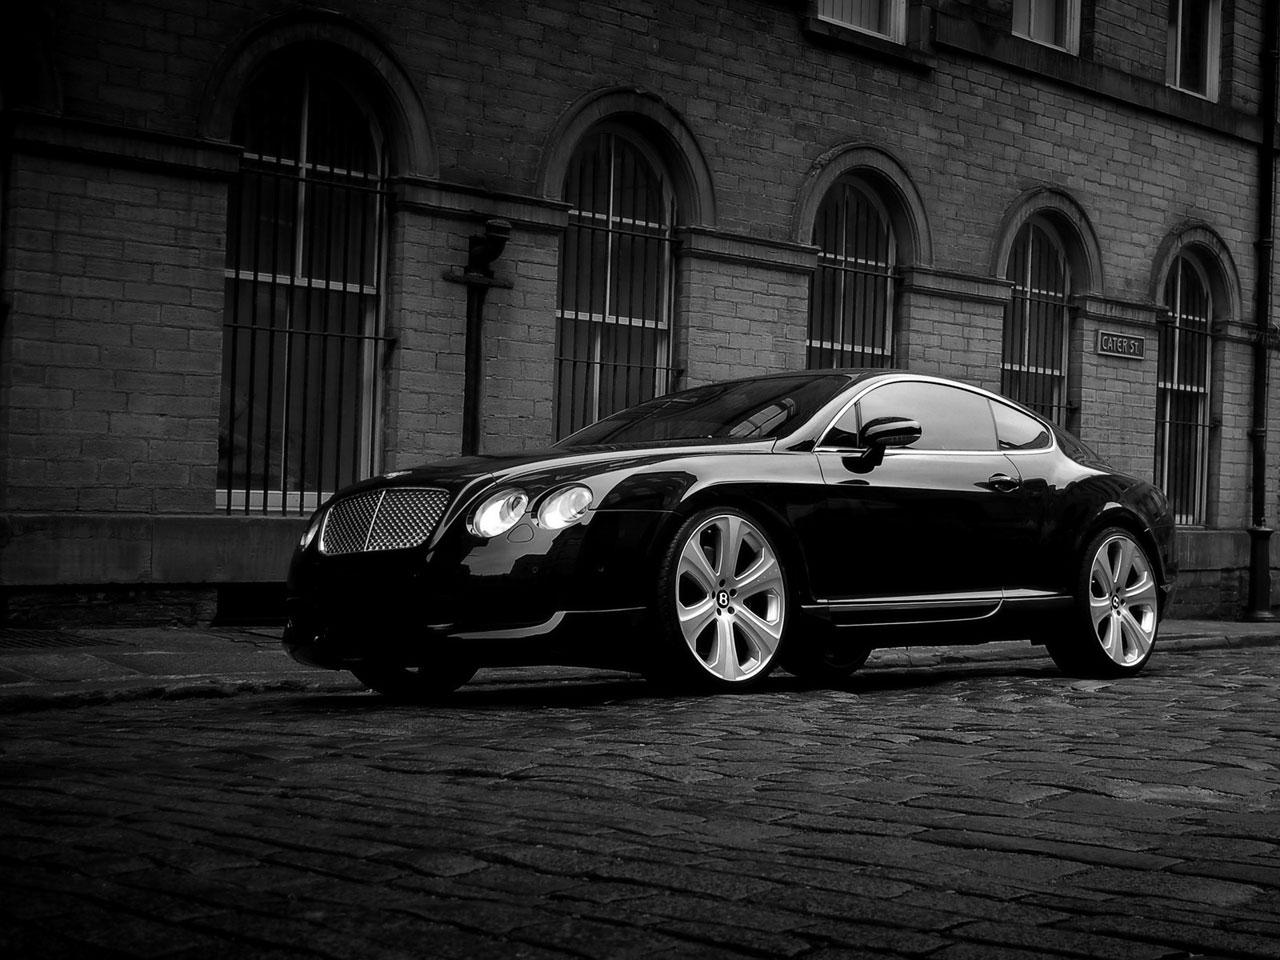 https://2.bp.blogspot.com/-nq1-3txFdAY/TcLwpw5uqyI/AAAAAAAAB1w/UNXhgmXs8fc/s1600/Bentley_ Continental_GT-S.jpg